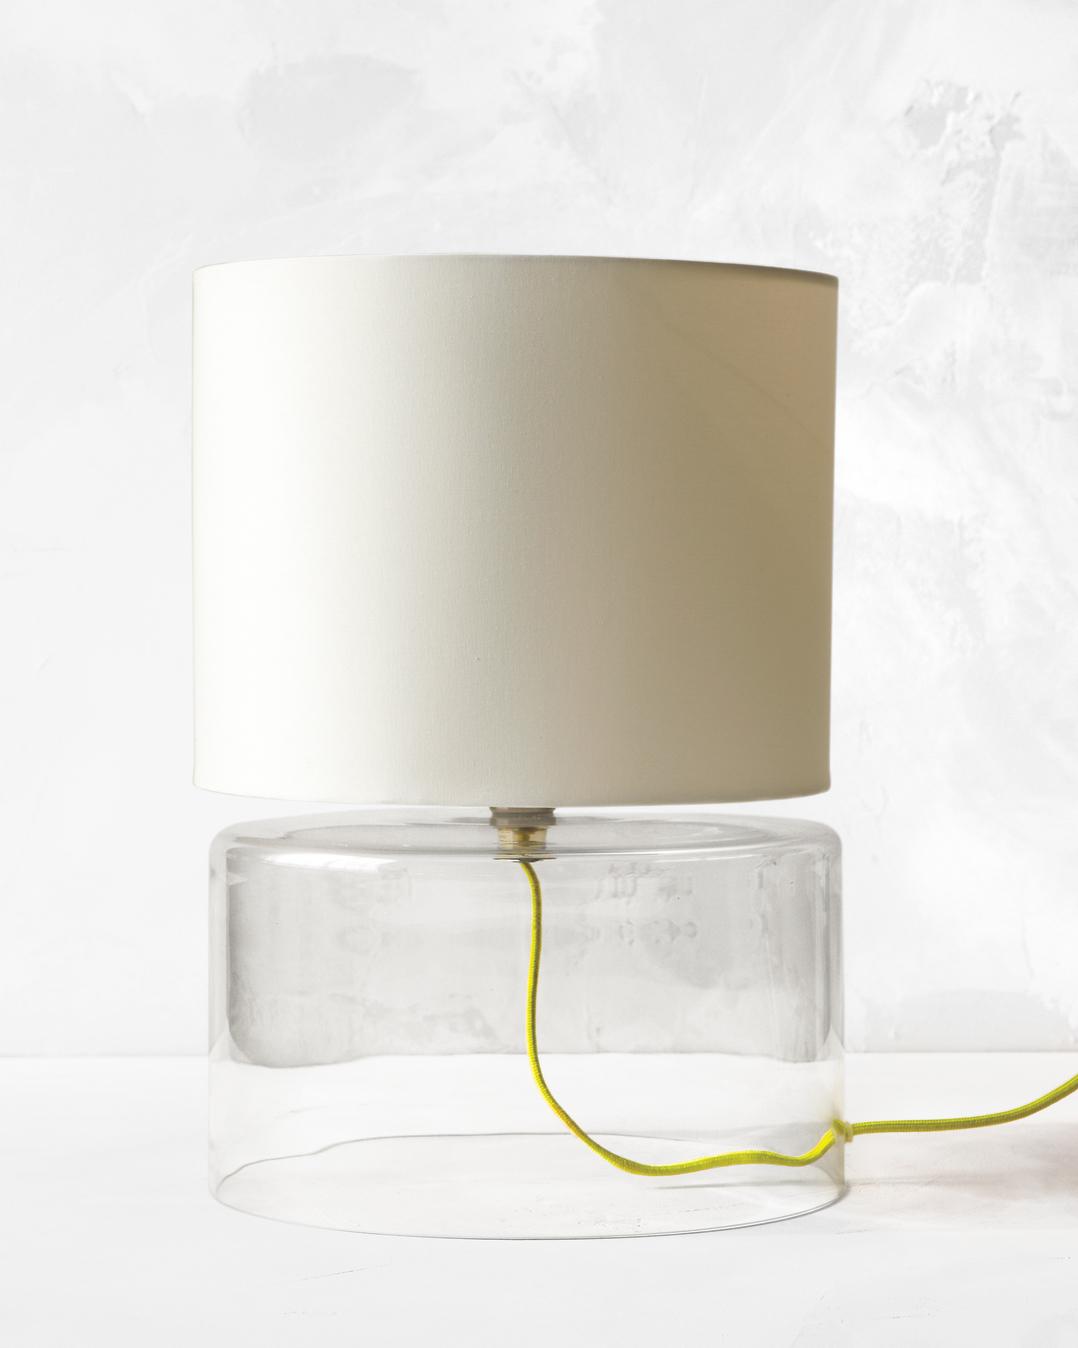 cb2-lamp-mwd108187.jpg